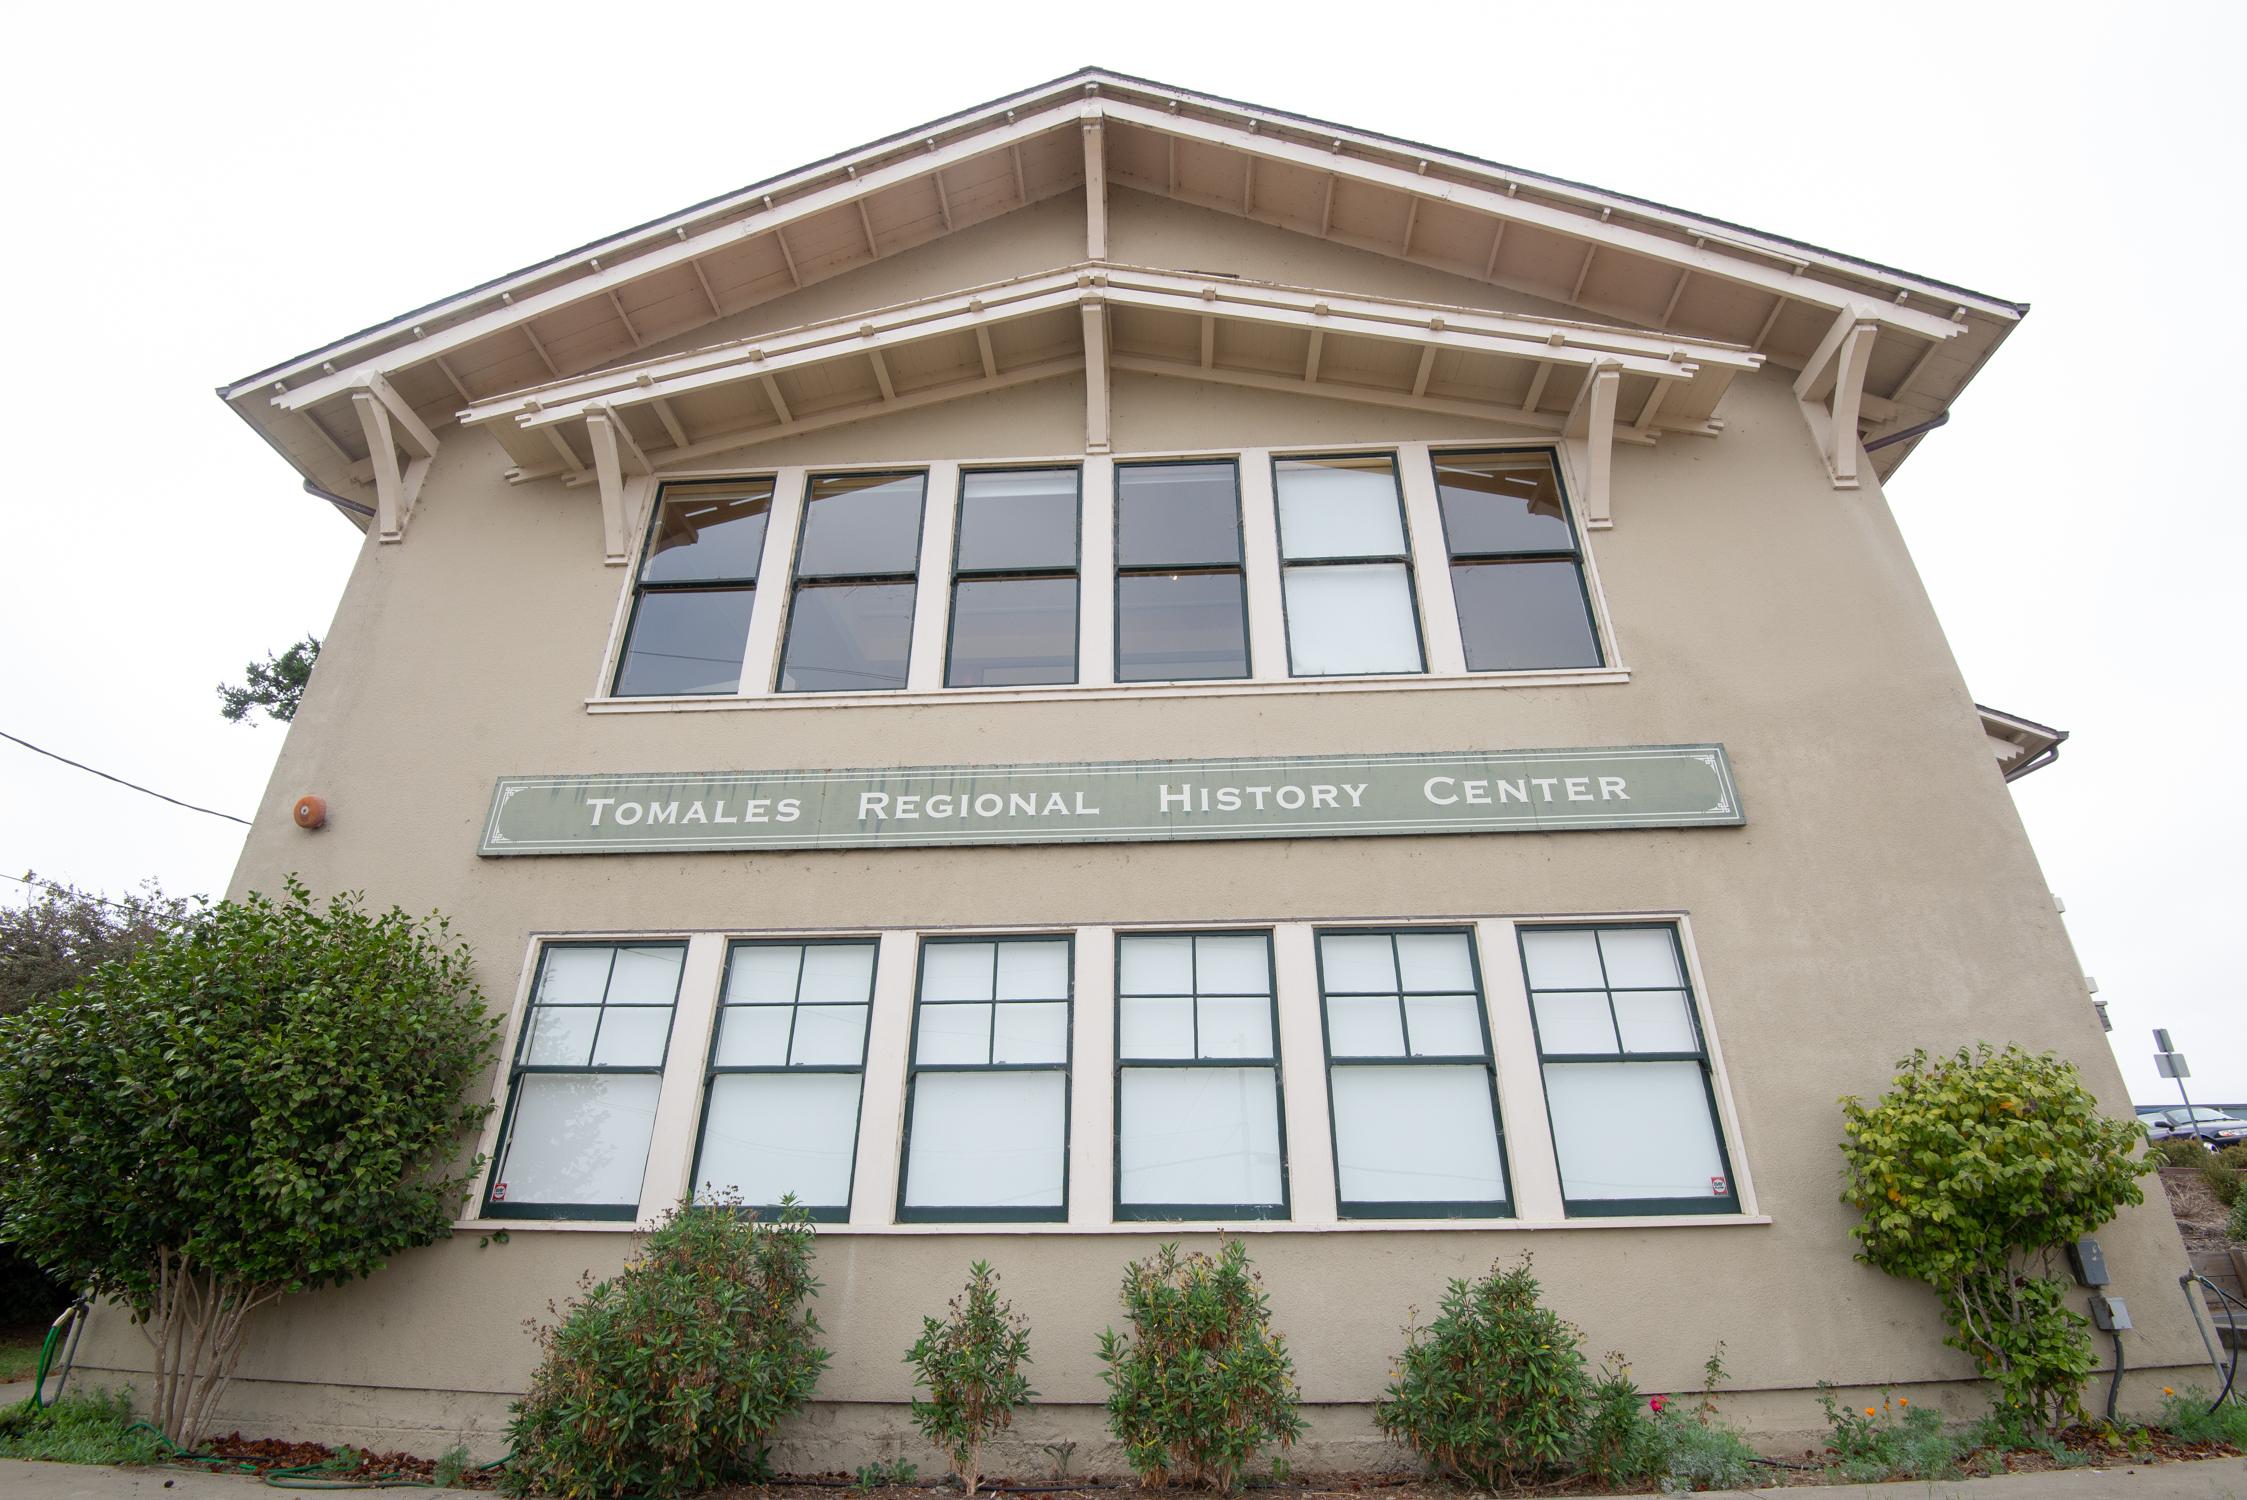 Tomales Regional History Center